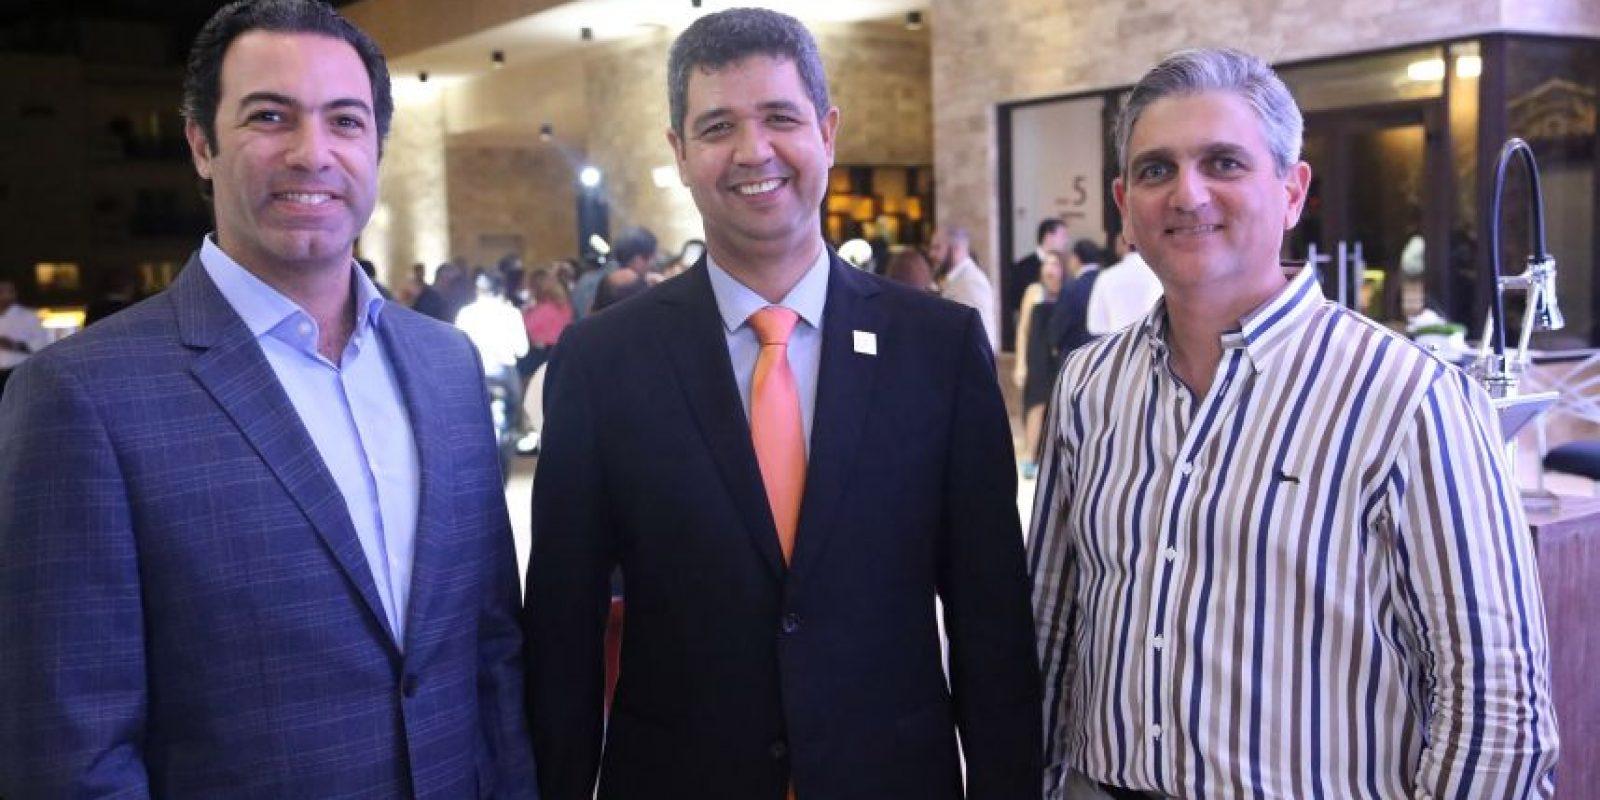 Jorge Montalvo, Katingo Santelises y Alejandro Santelises Foto:Fuente Externa